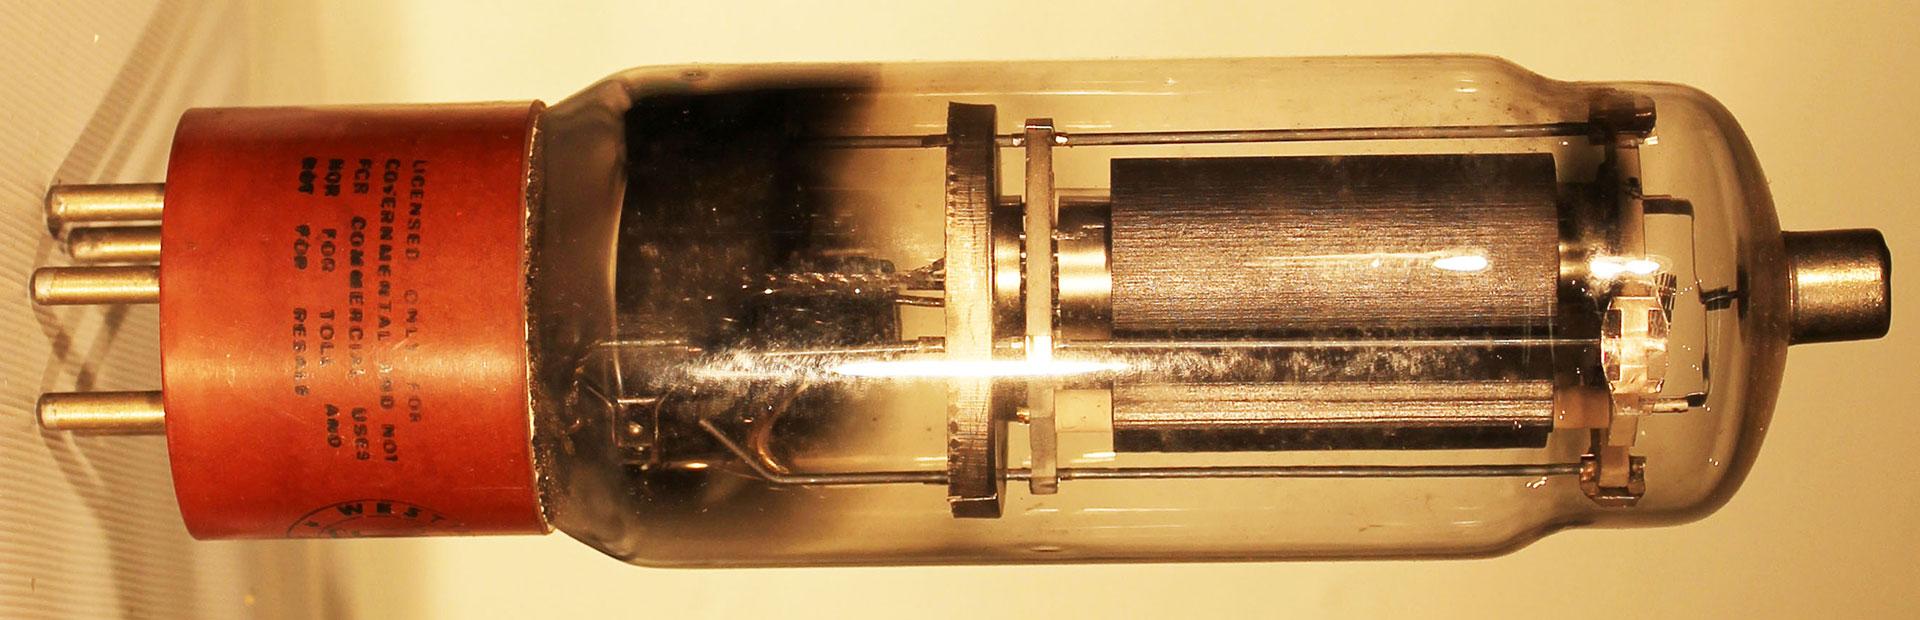 tube3-1920